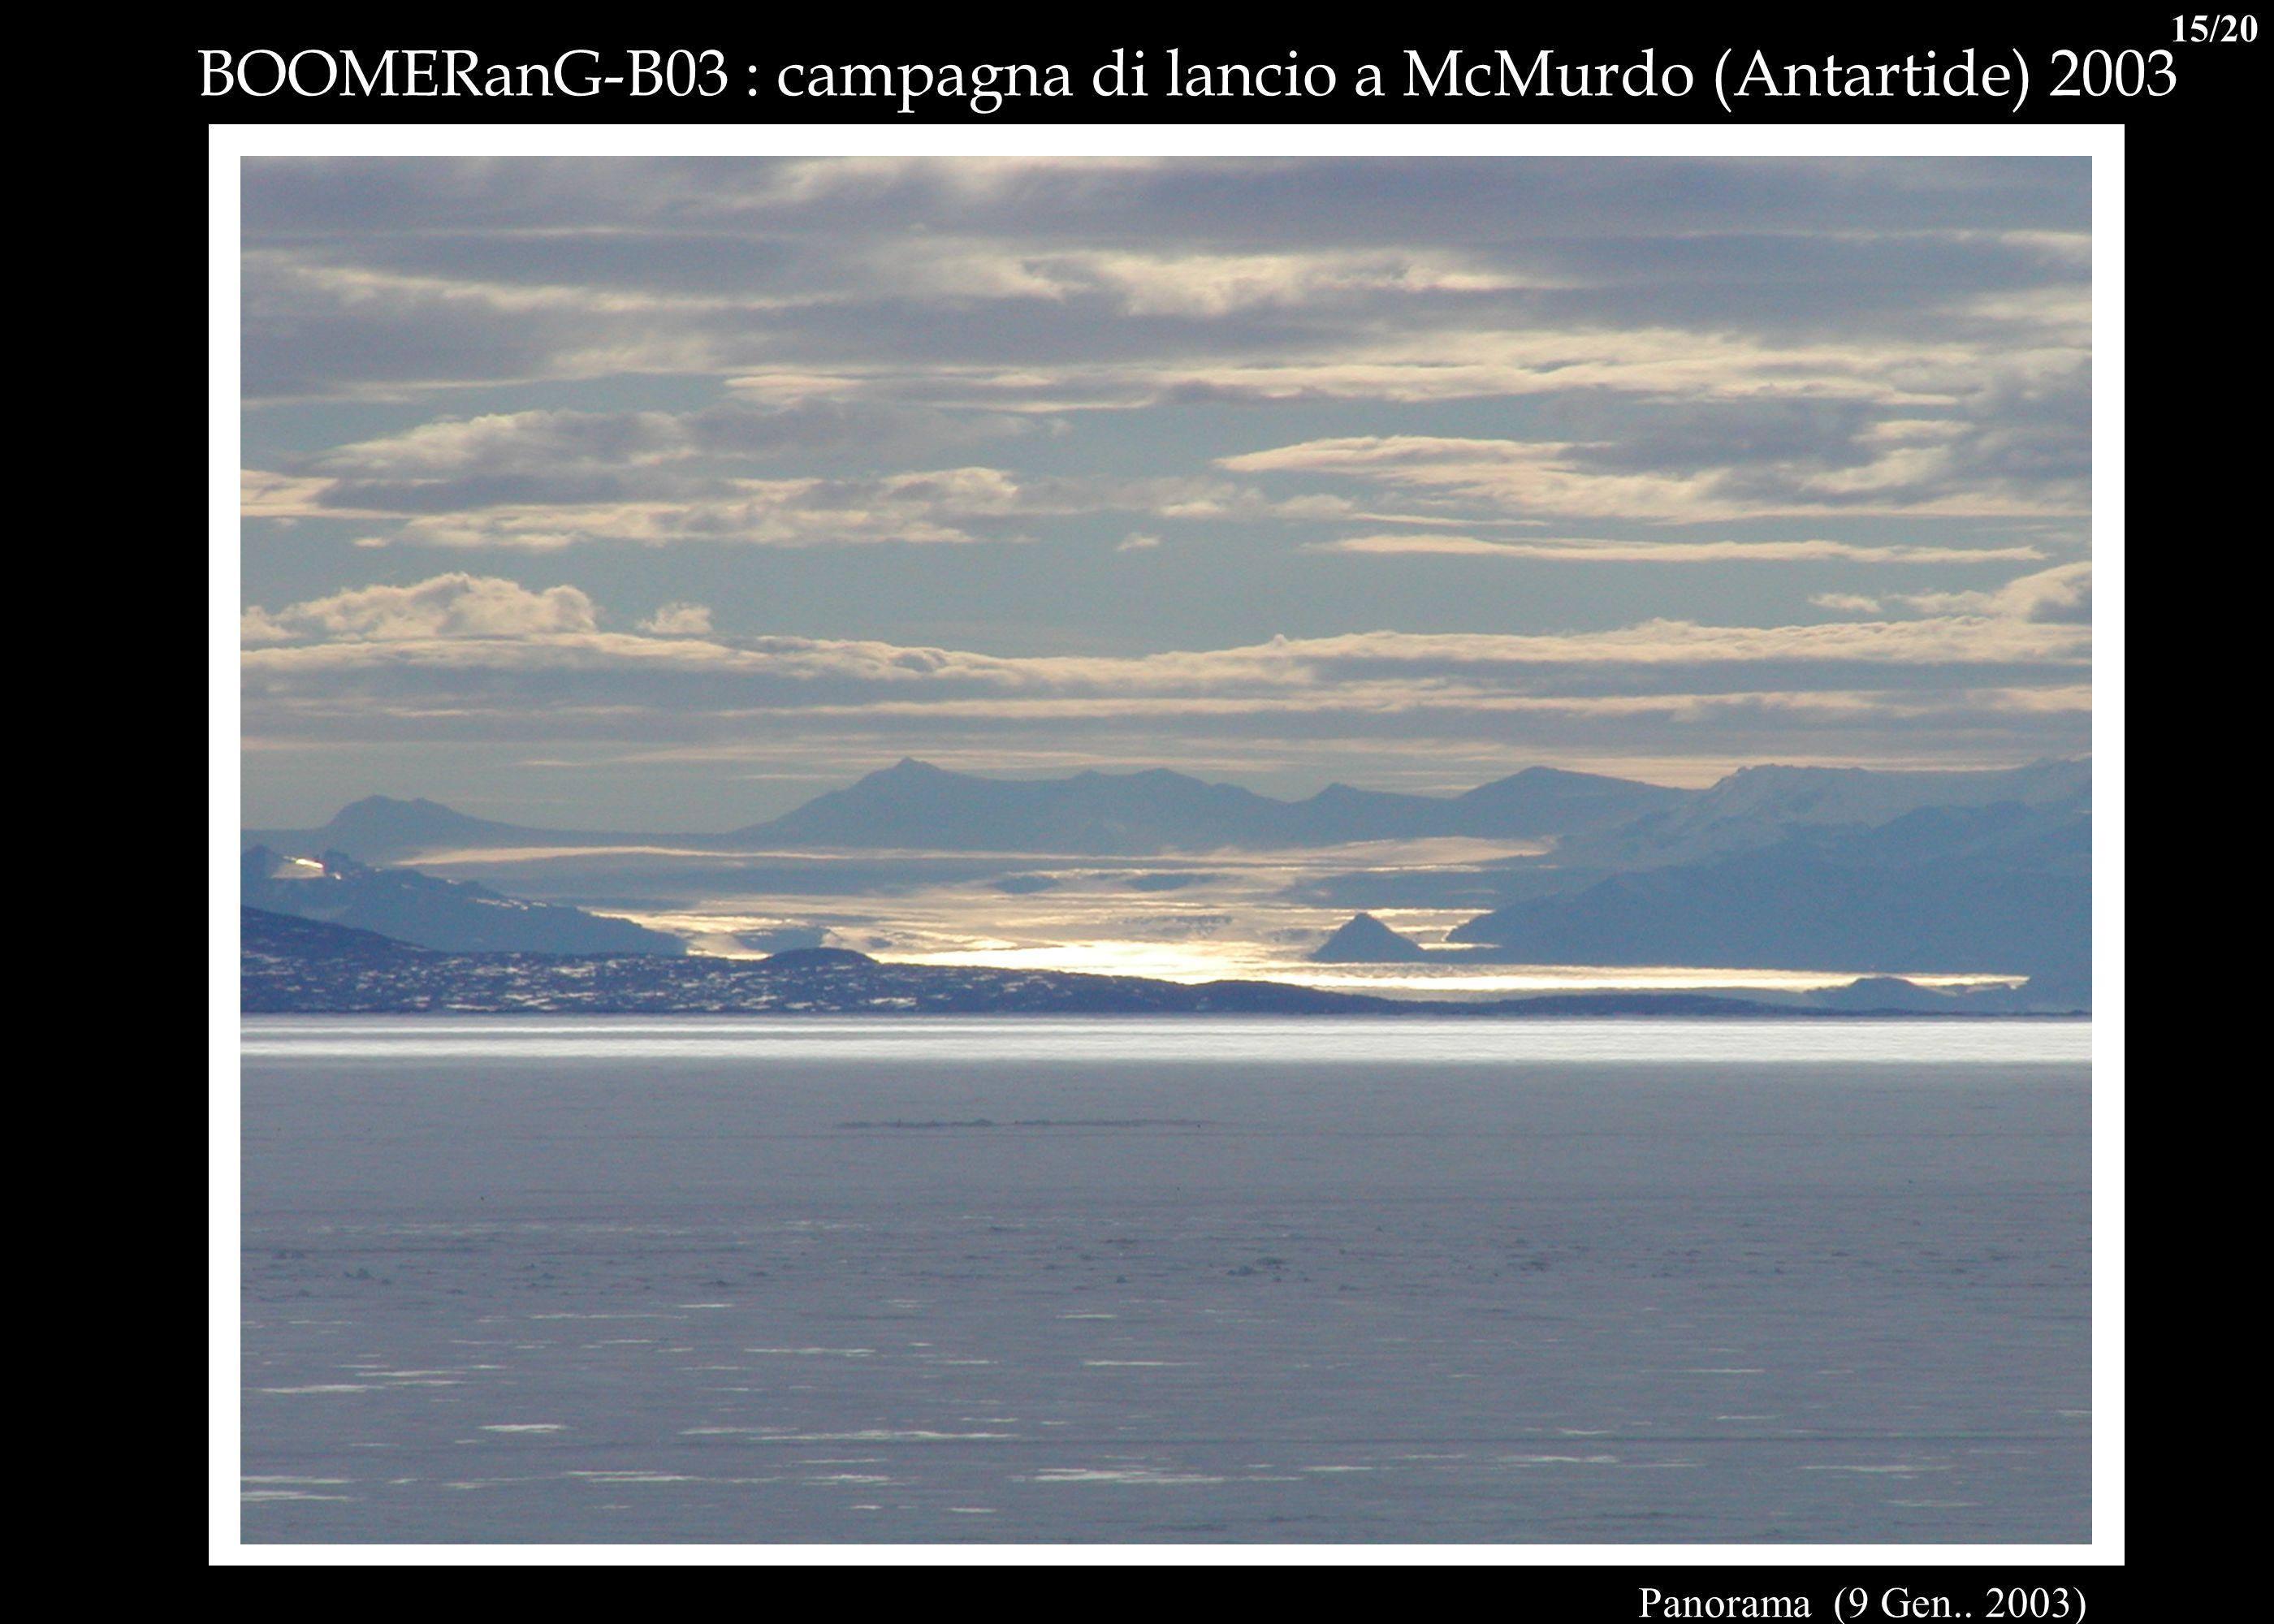 BOOMERanG-B03 : campagna di lancio a McMurdo (Antartide) 2003 Panorama (9 Gen.. 2003) 15/20